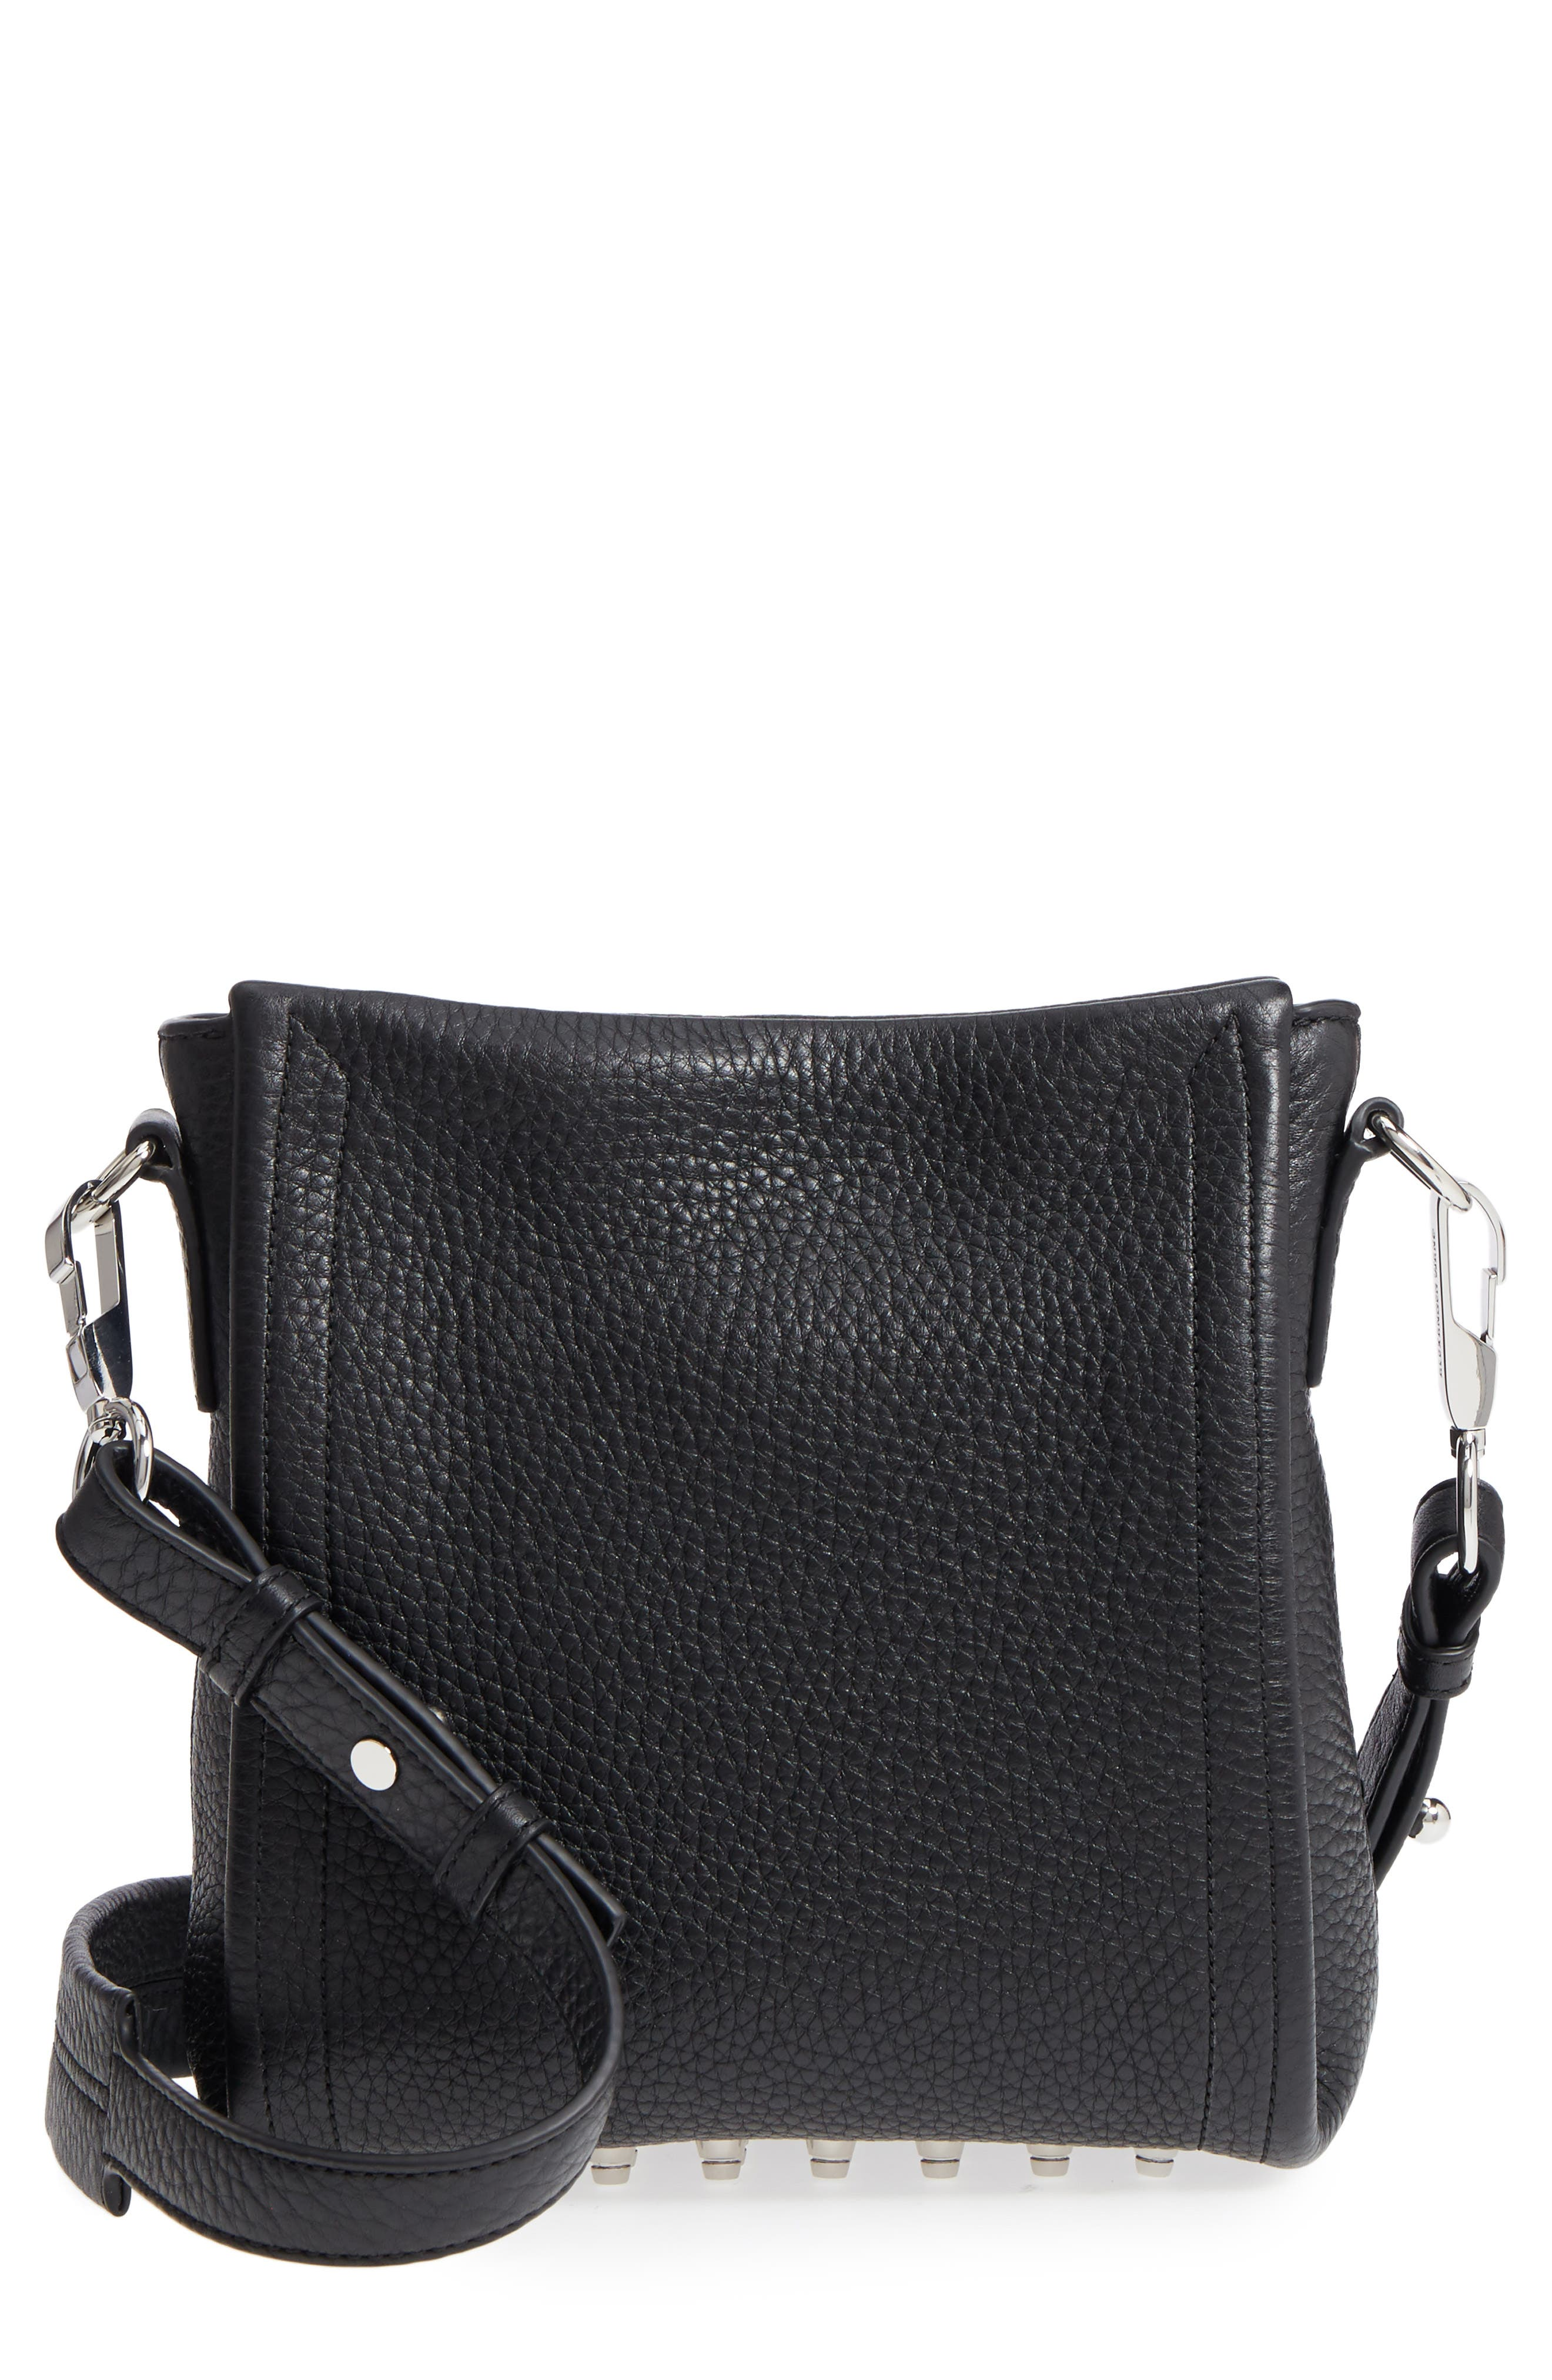 Main Image - Alexander Wang Mini Darcy Leather Shoulder Bag